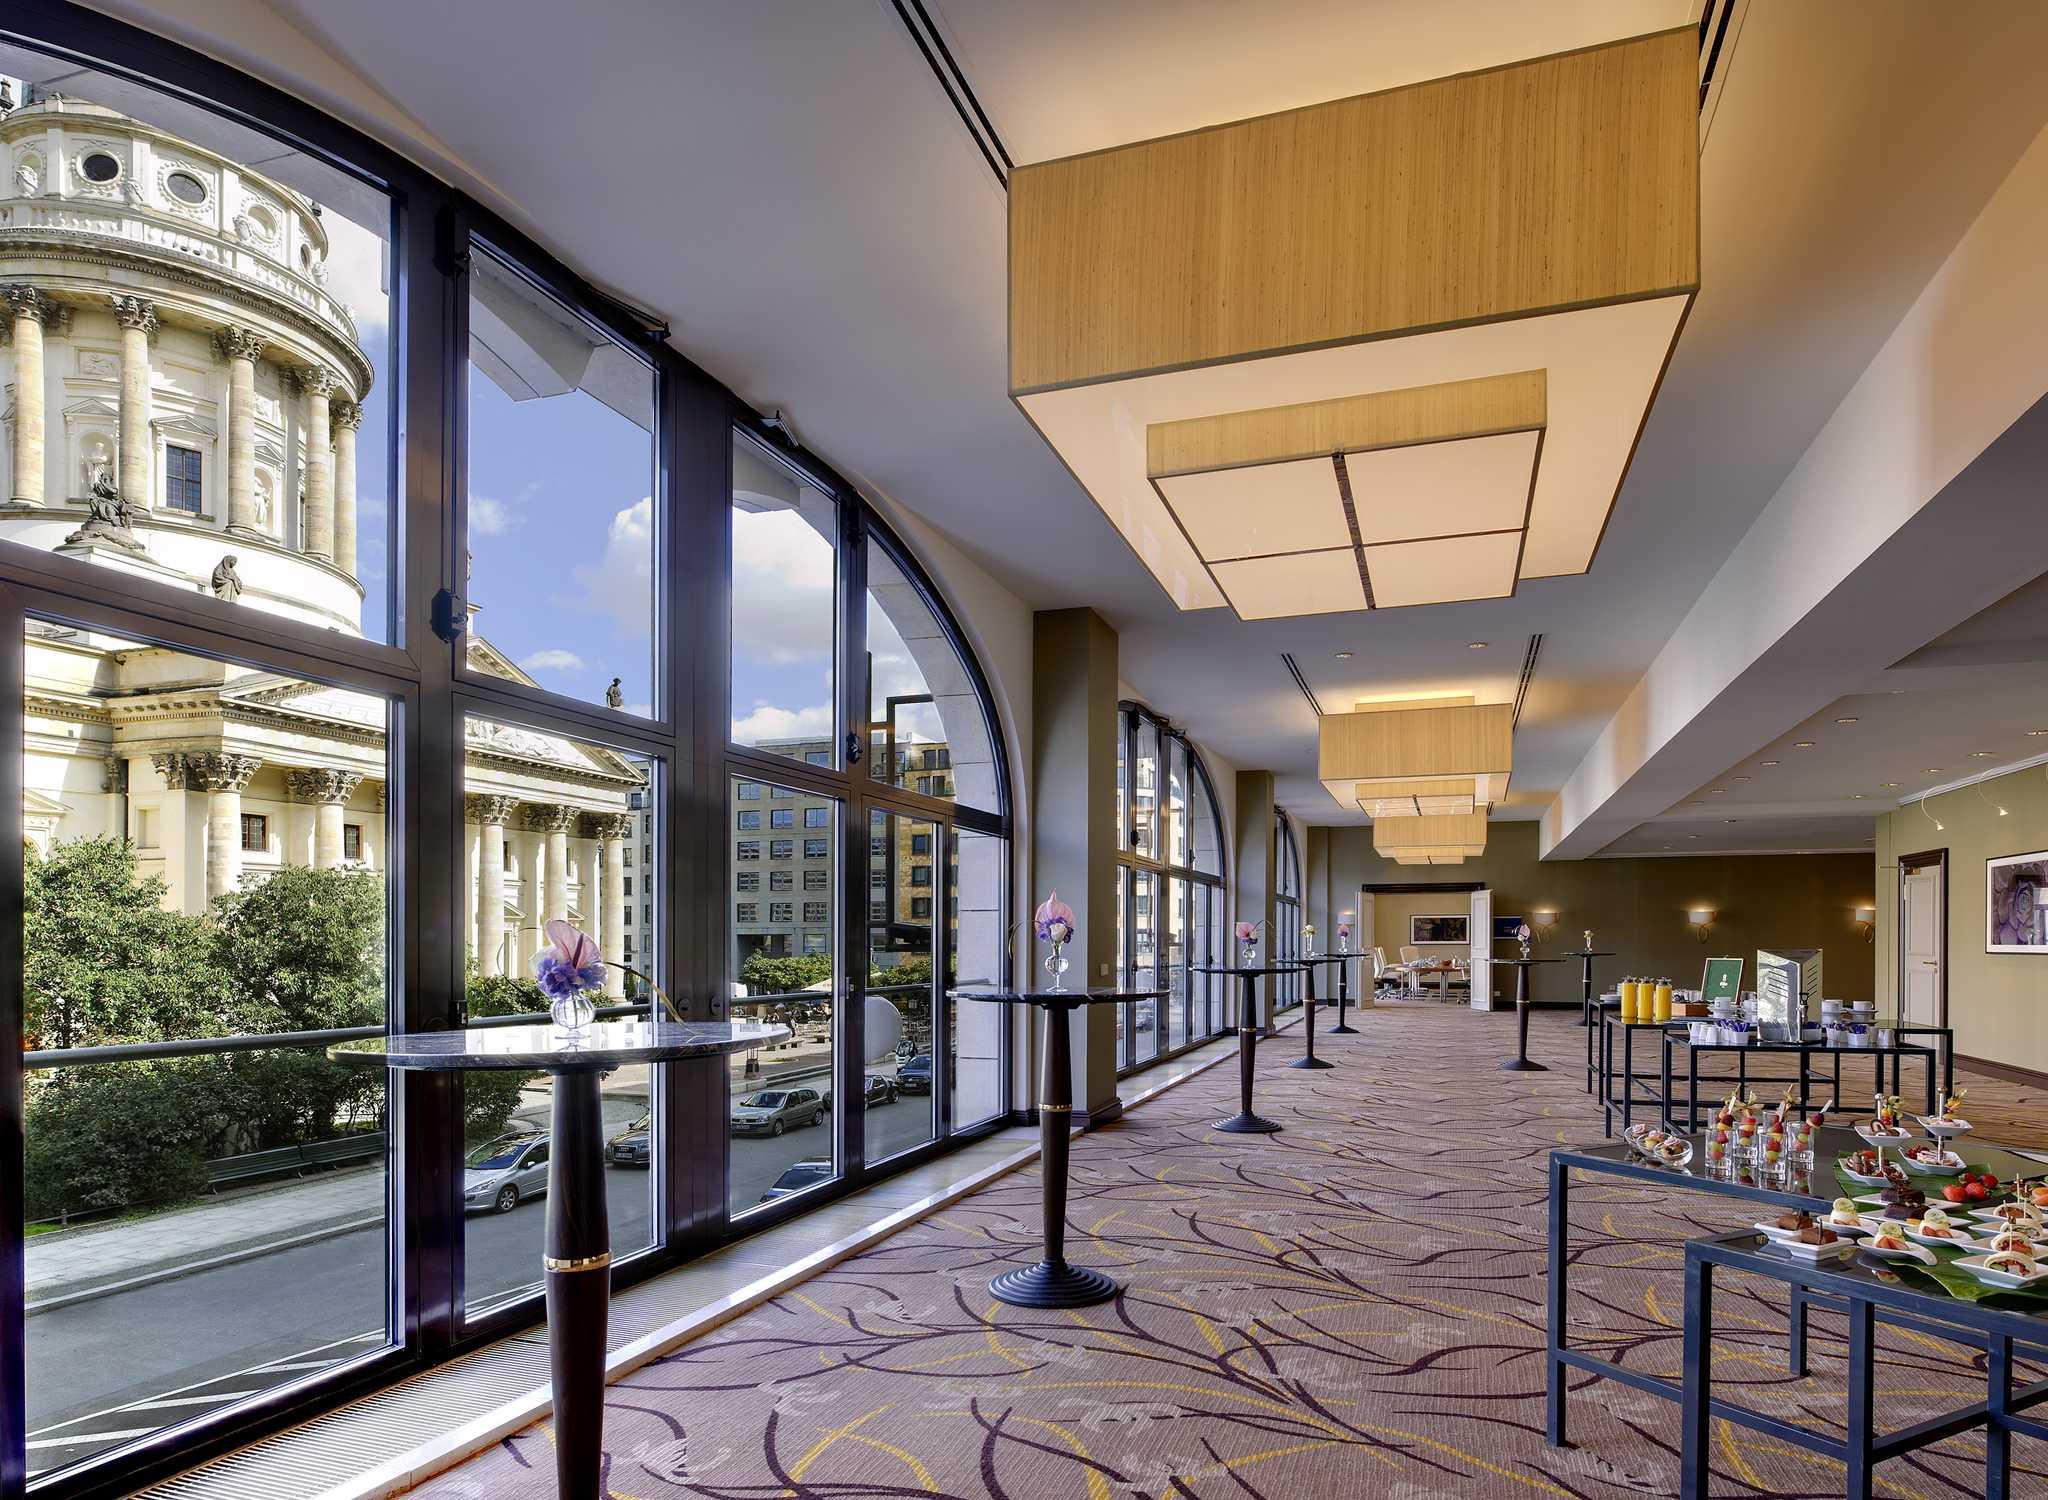 hilton berlin hotel hotel in berlijn duitsland hotel in berlin mitte. Black Bedroom Furniture Sets. Home Design Ideas